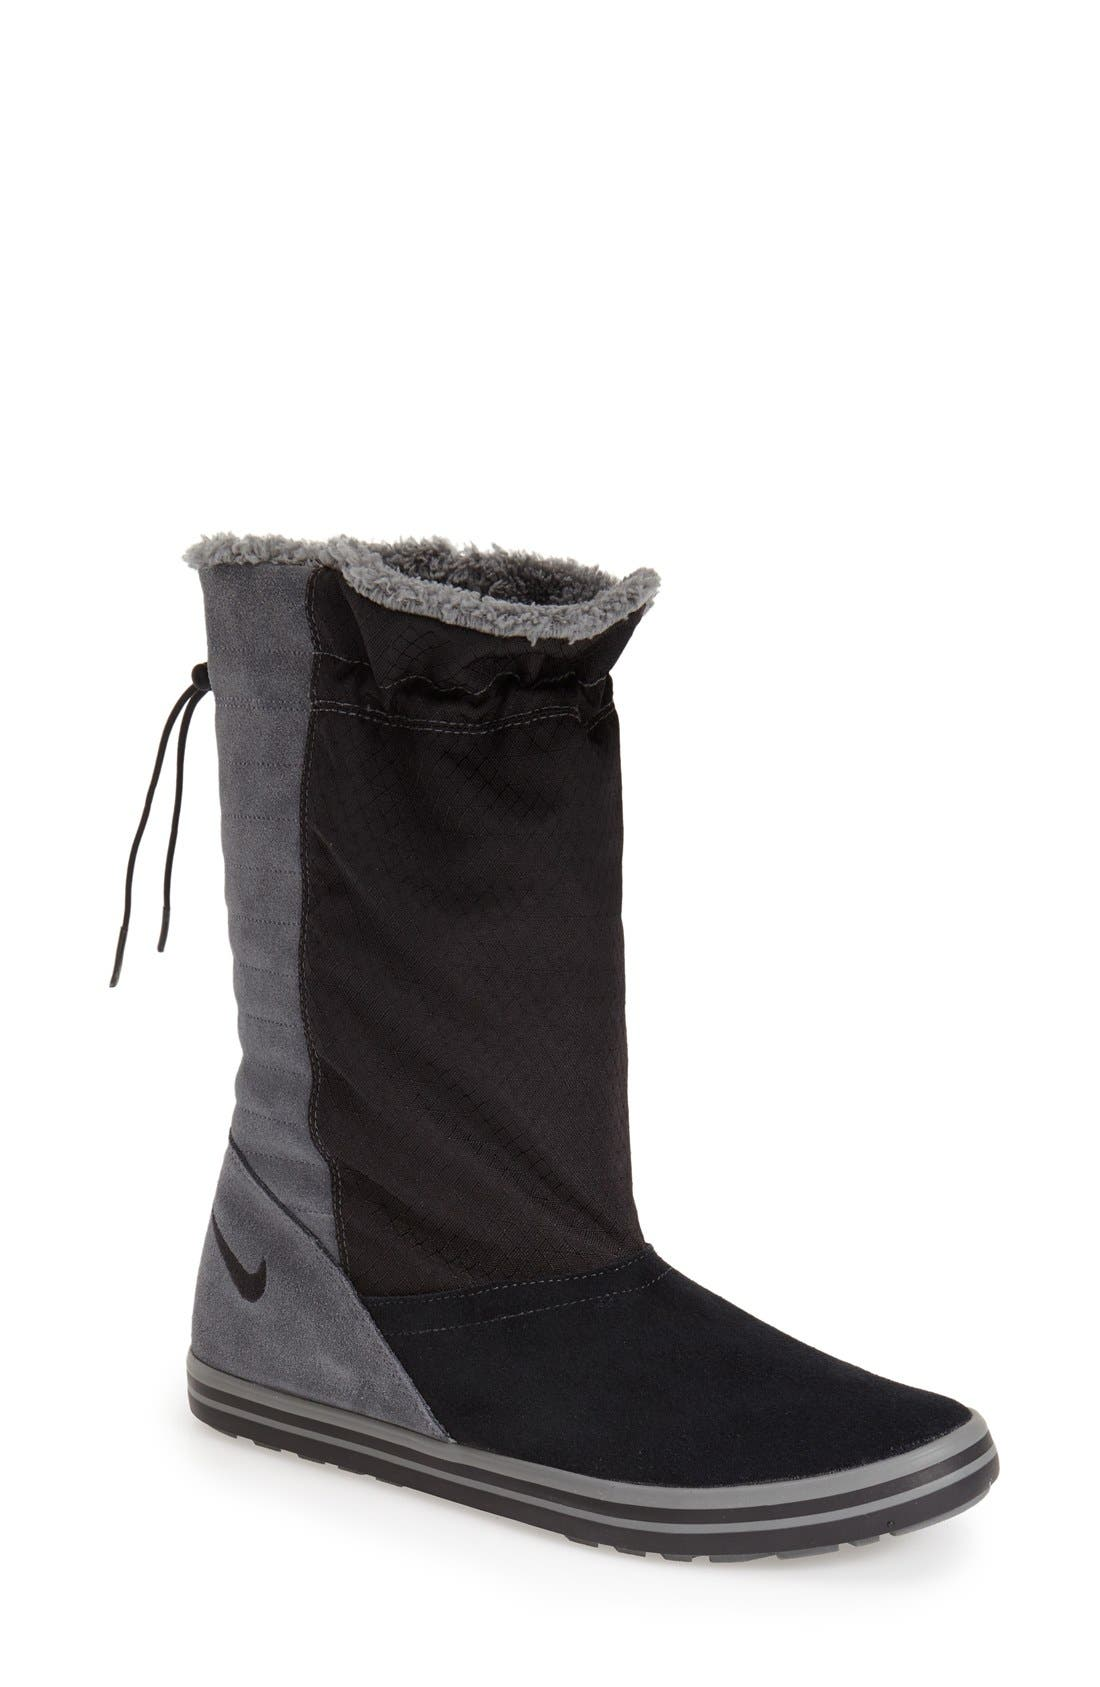 Nike Facile Mid-Calf Women Boots